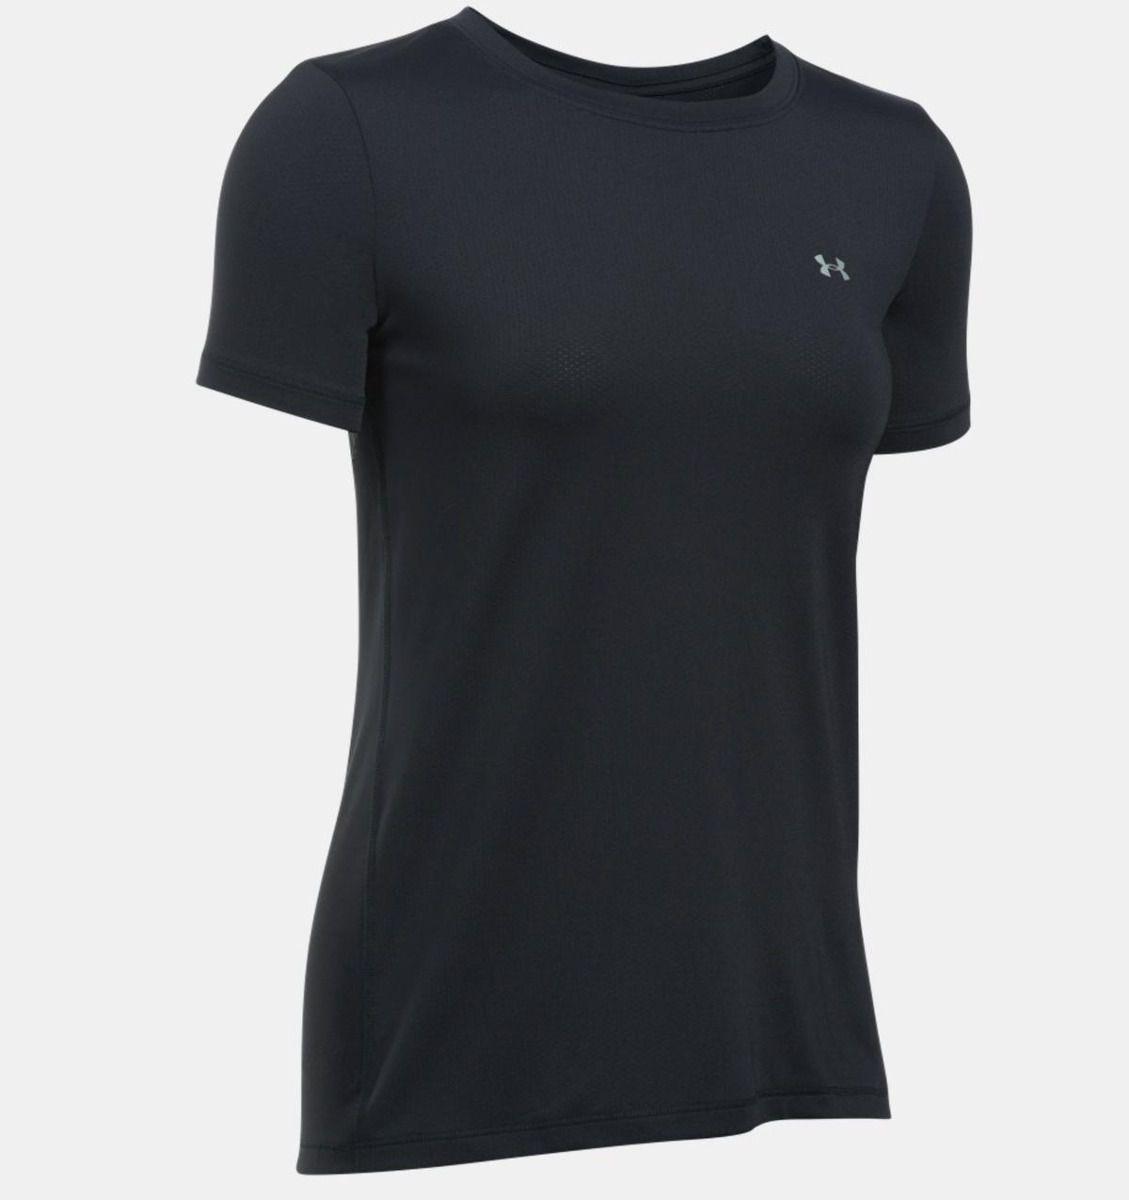 Camiseta Feminina Under Armour Heatgear